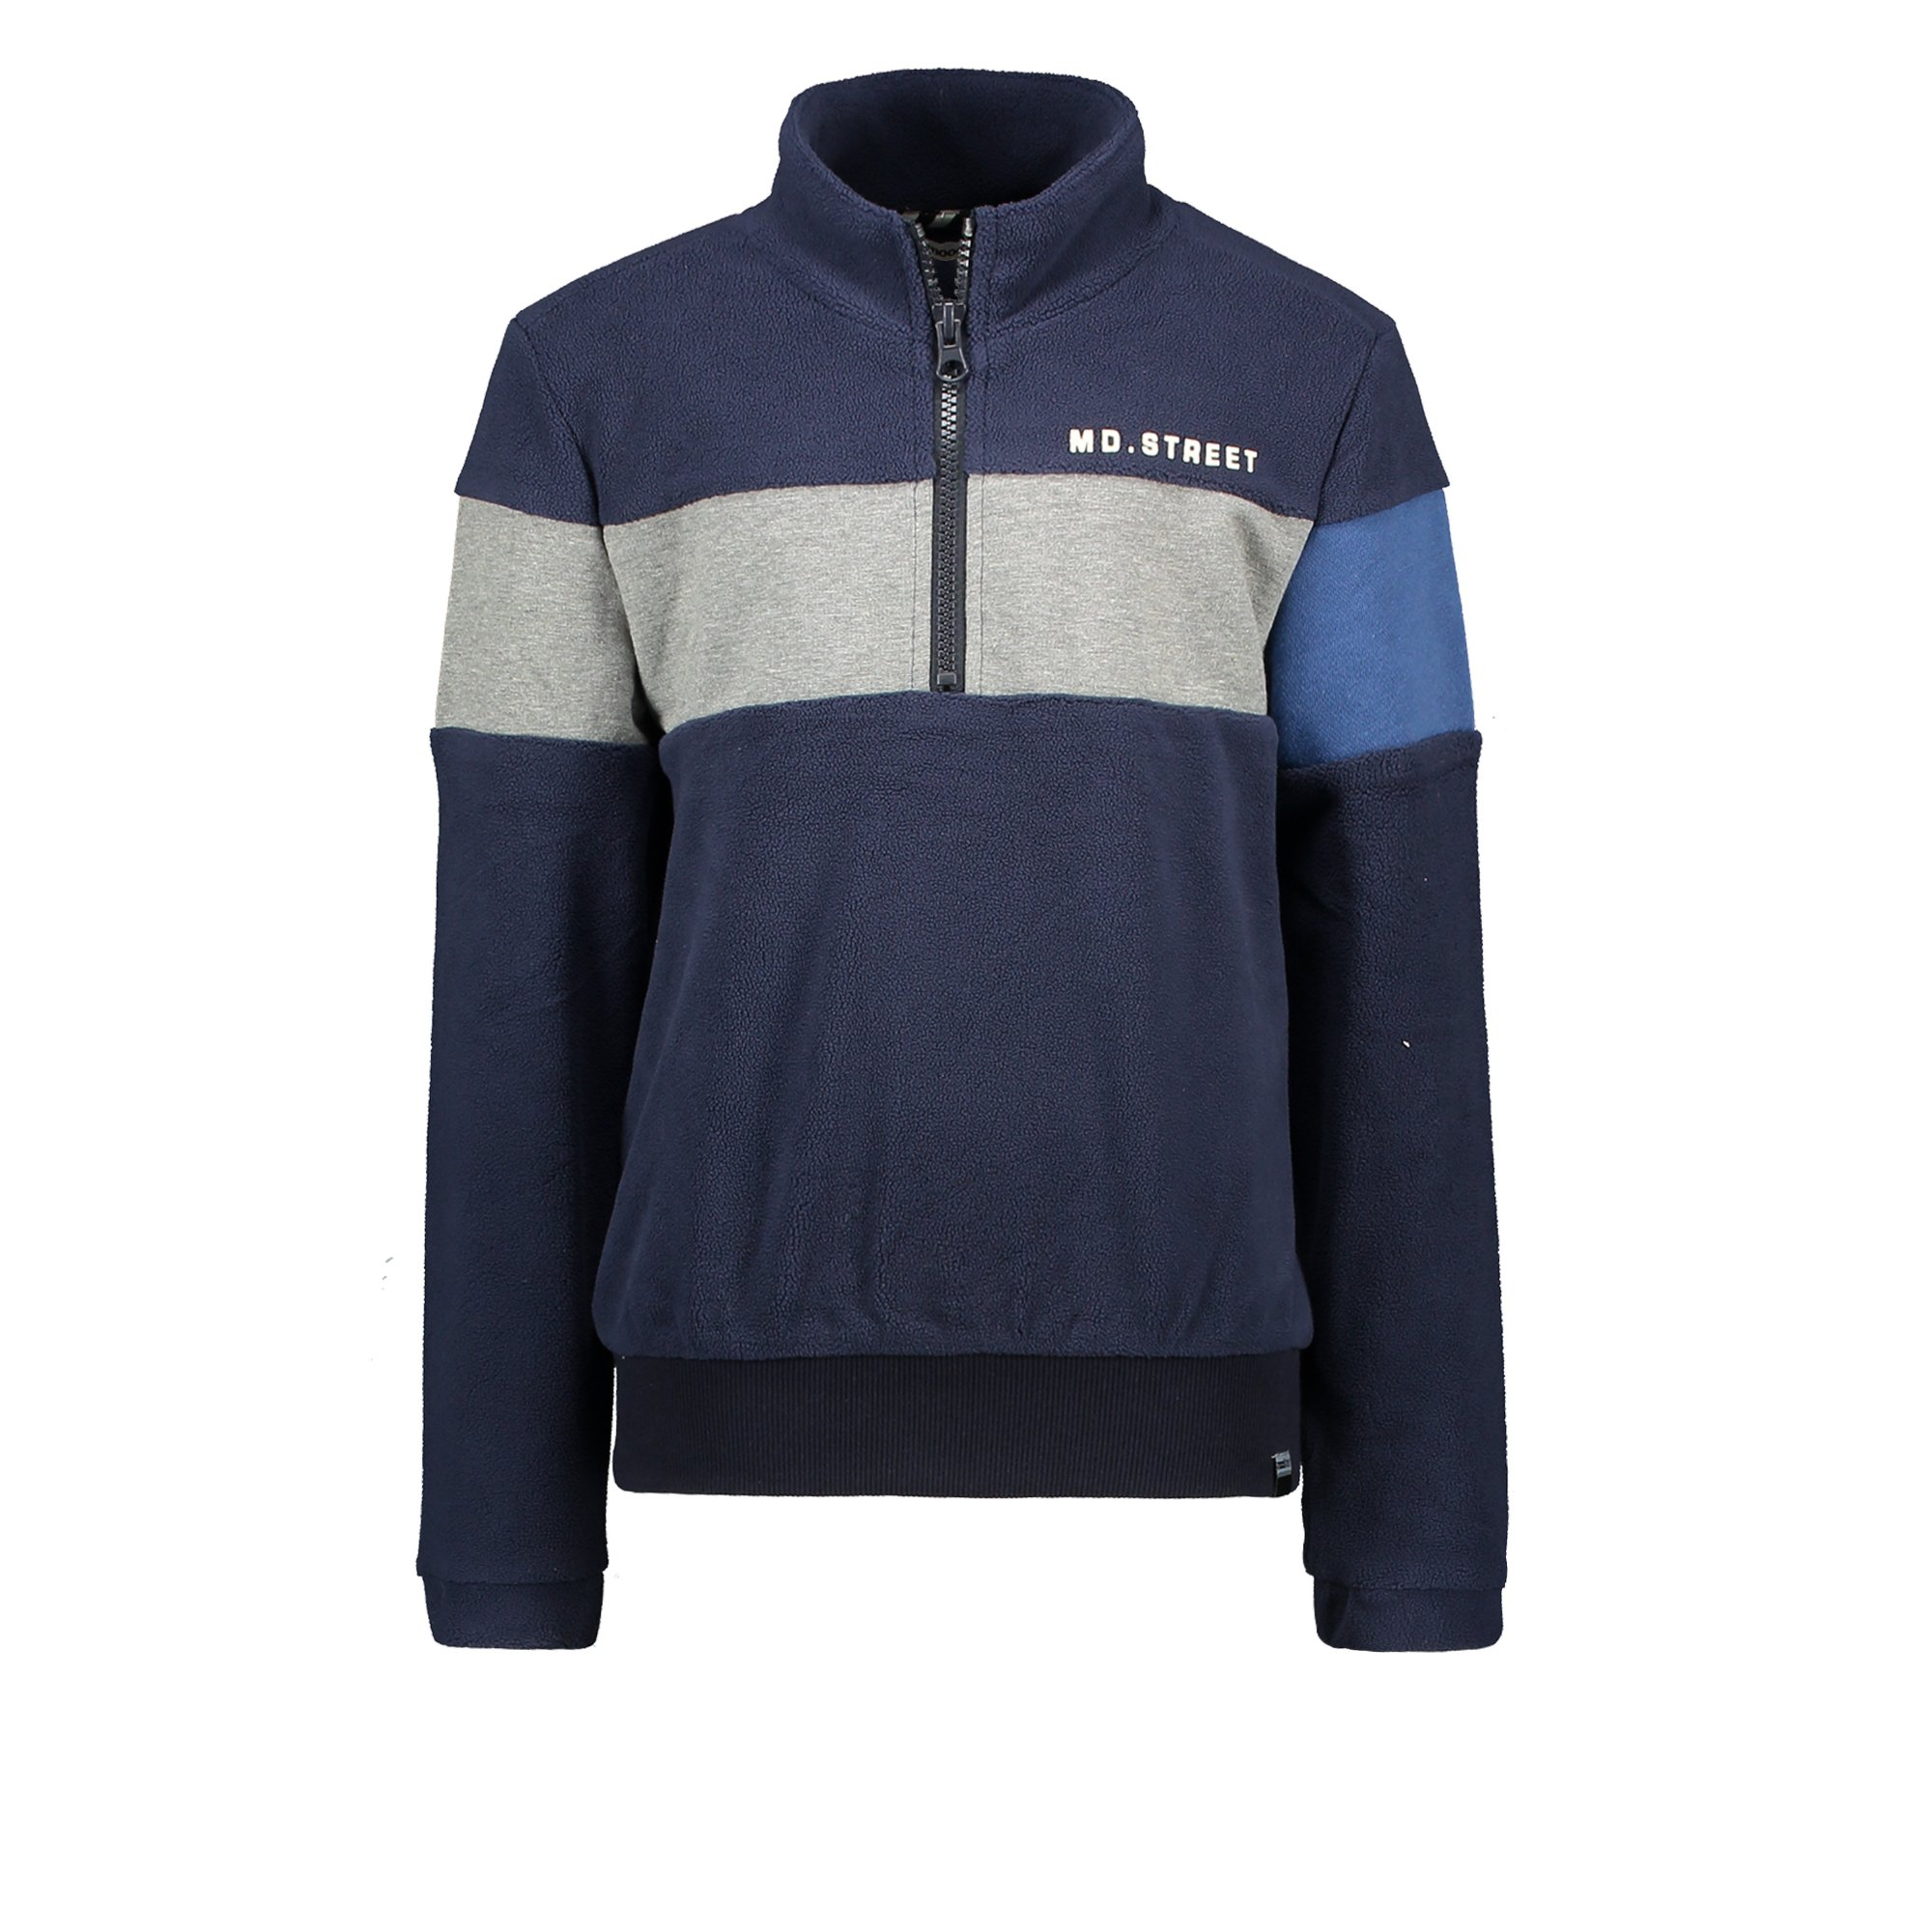 MT sweater polarfleece